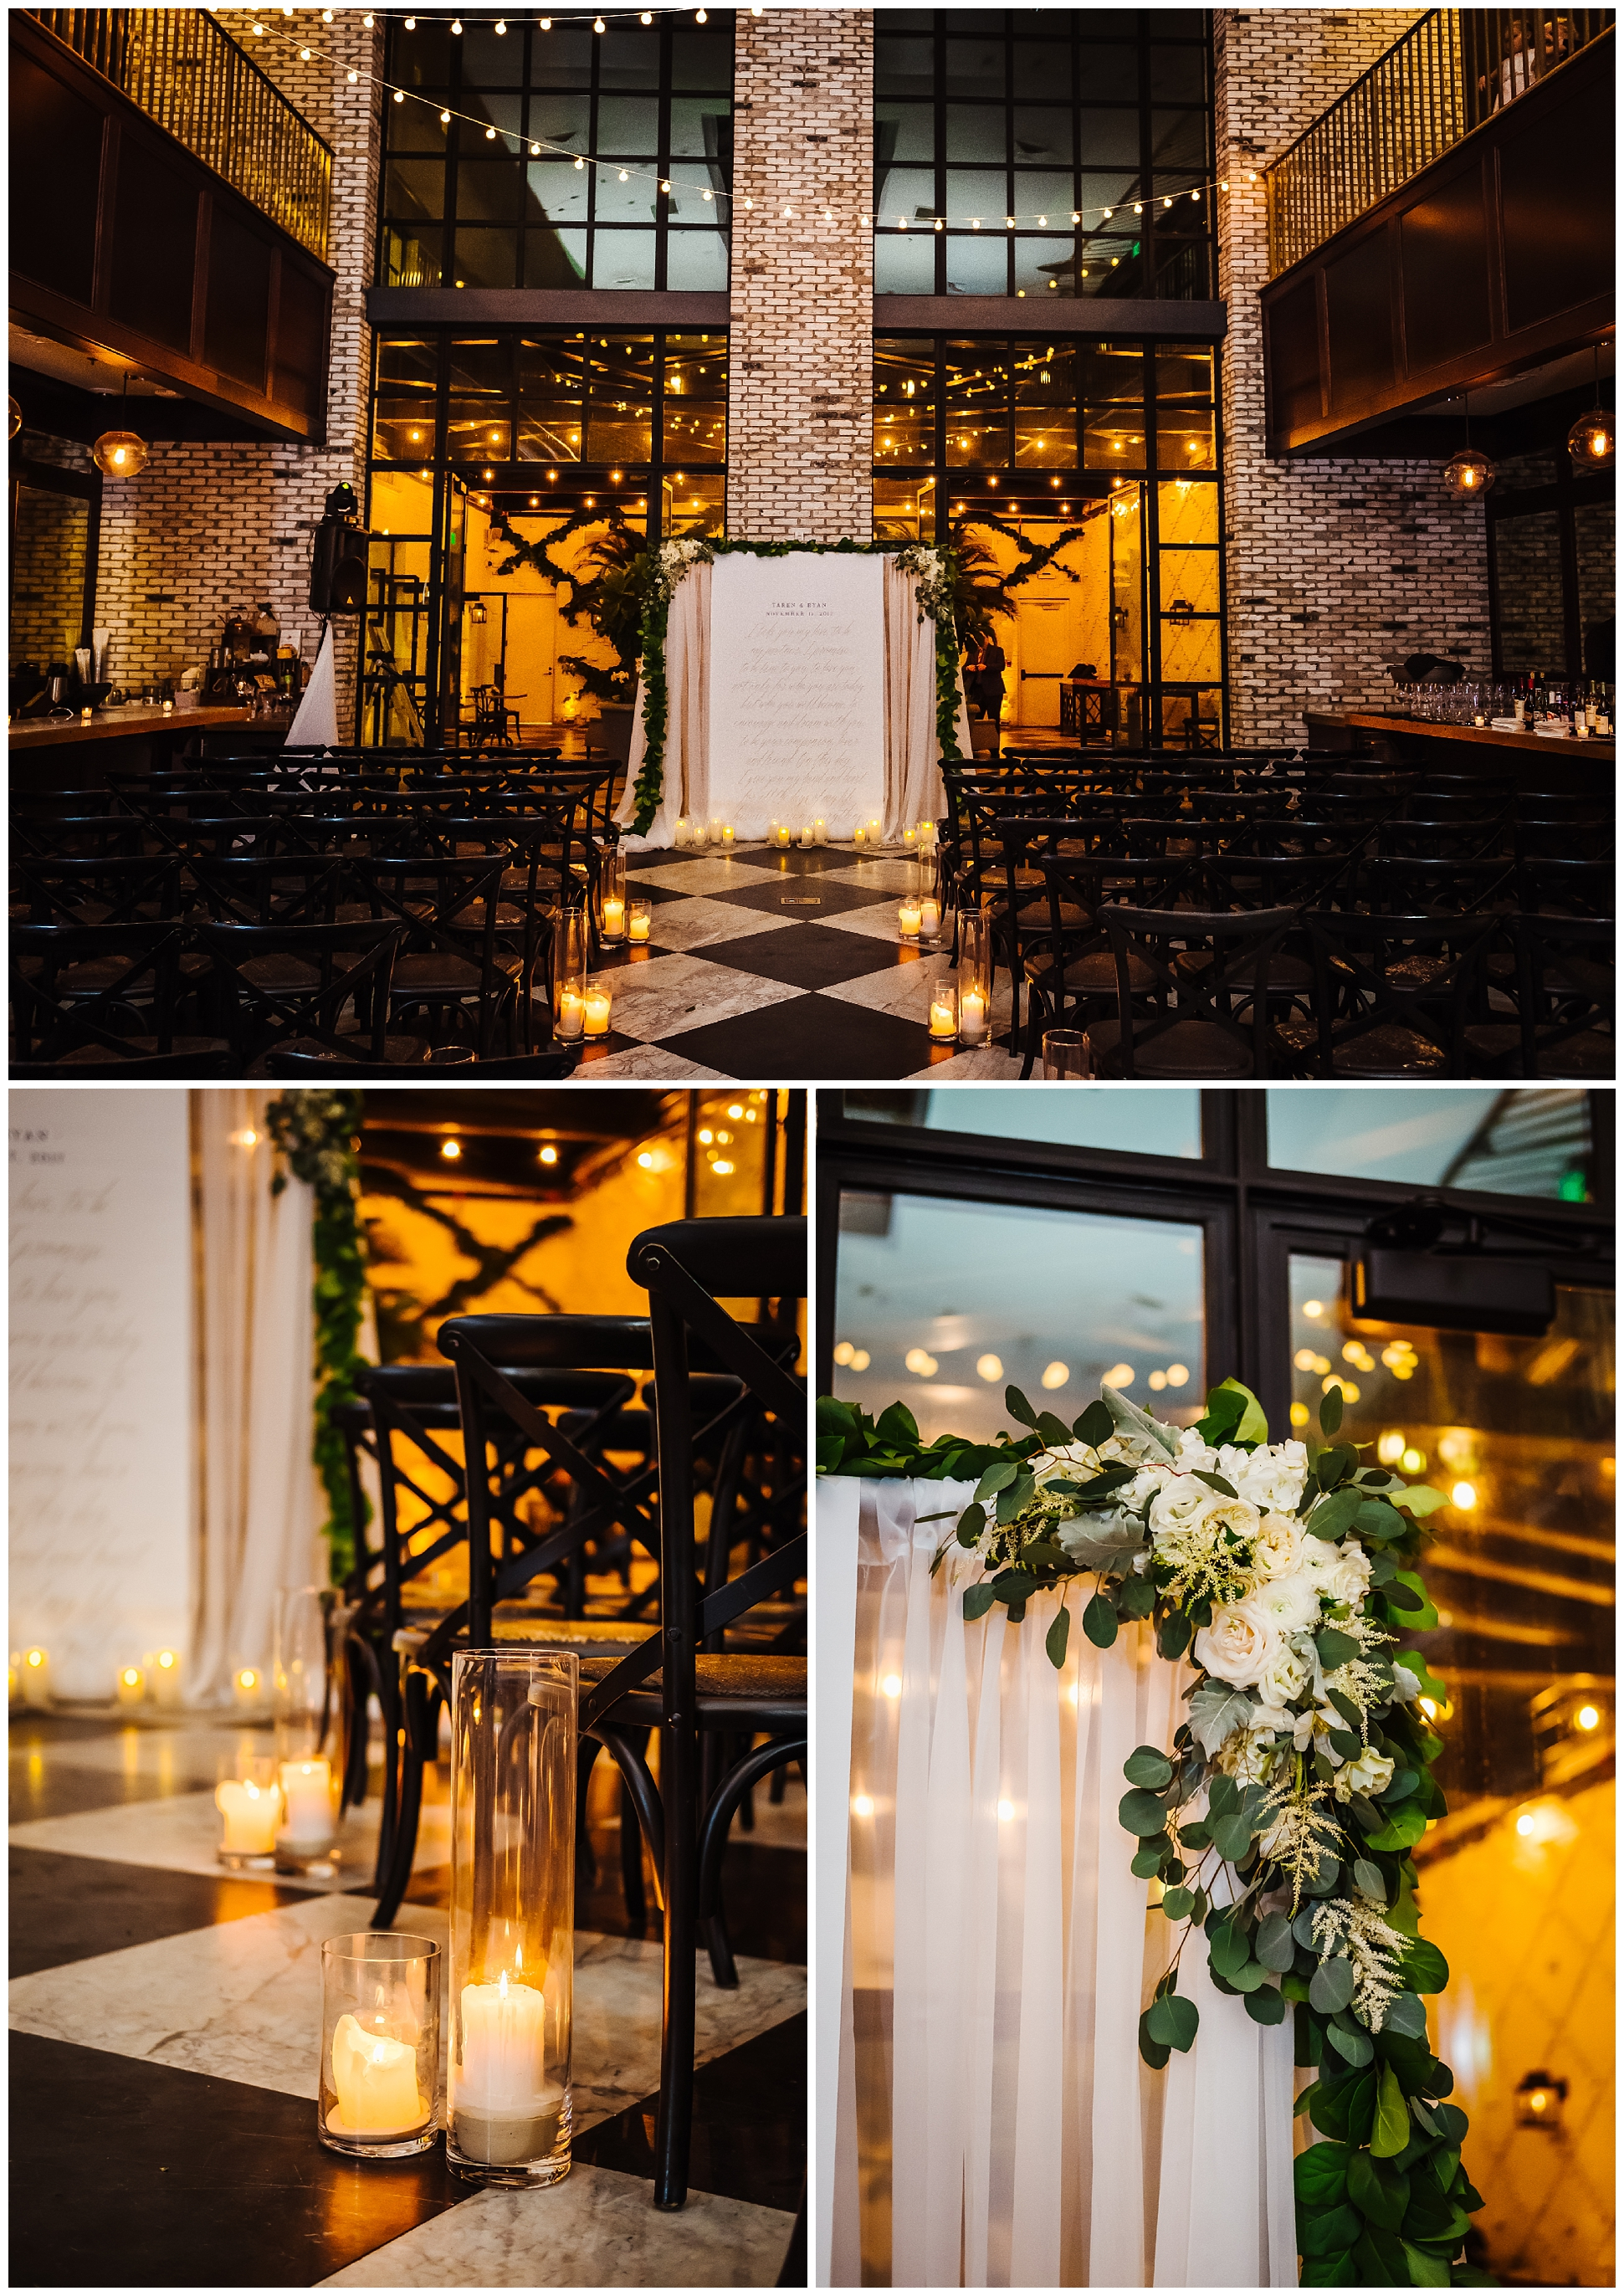 tampa-wedding-photographer-oxford-exchange-garland-candlelight-gold-hayley-paige_0041.jpg